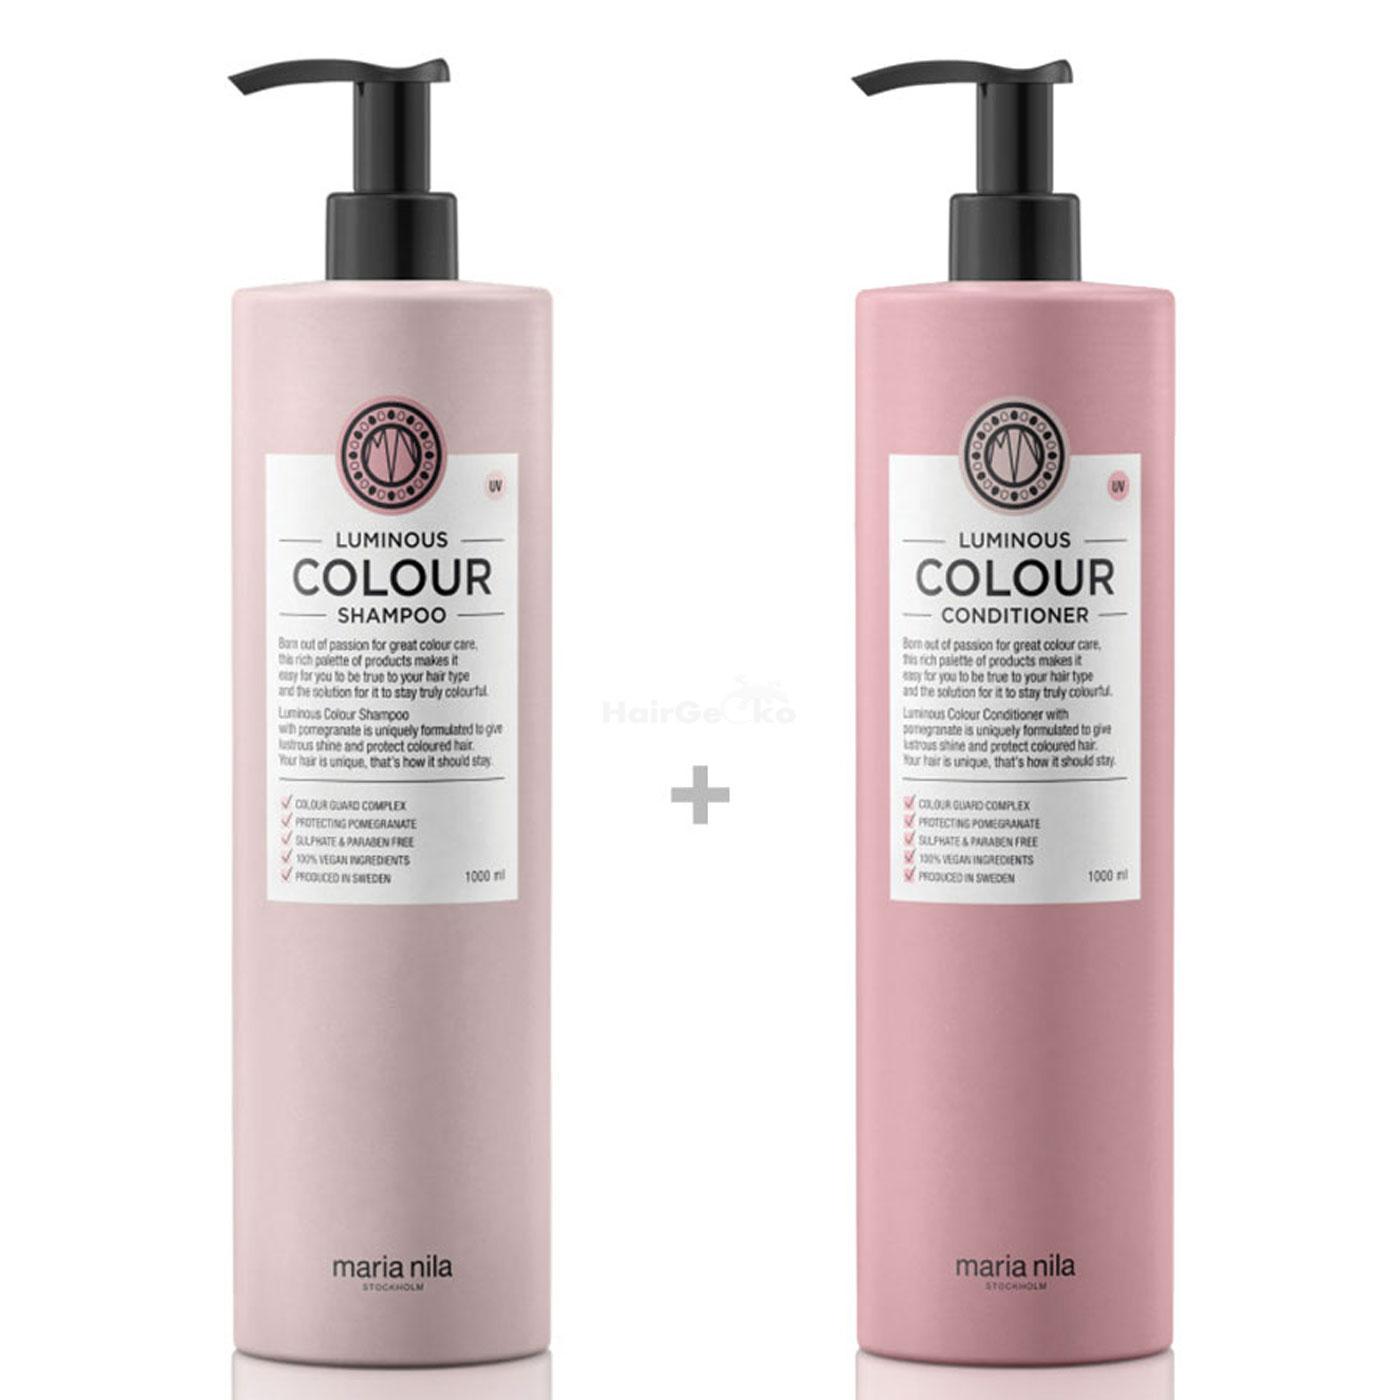 Maria Nila Luminous Colour XXL Set - Shampoo 1000 ml + Conditioner 1000 ml